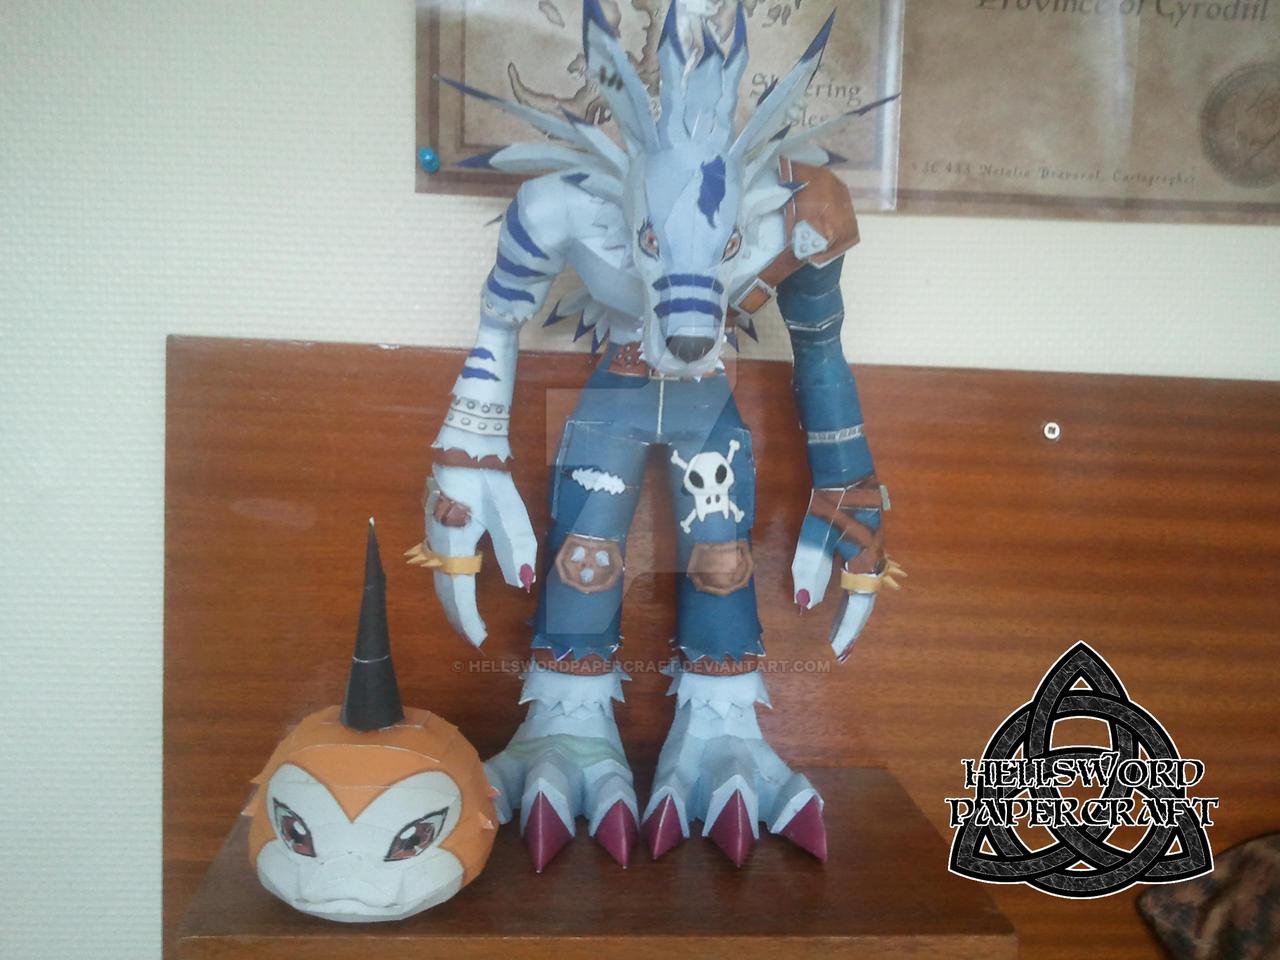 Digimon Tsunomon and WereGarurumon Papercraft by HellswordPapercraft